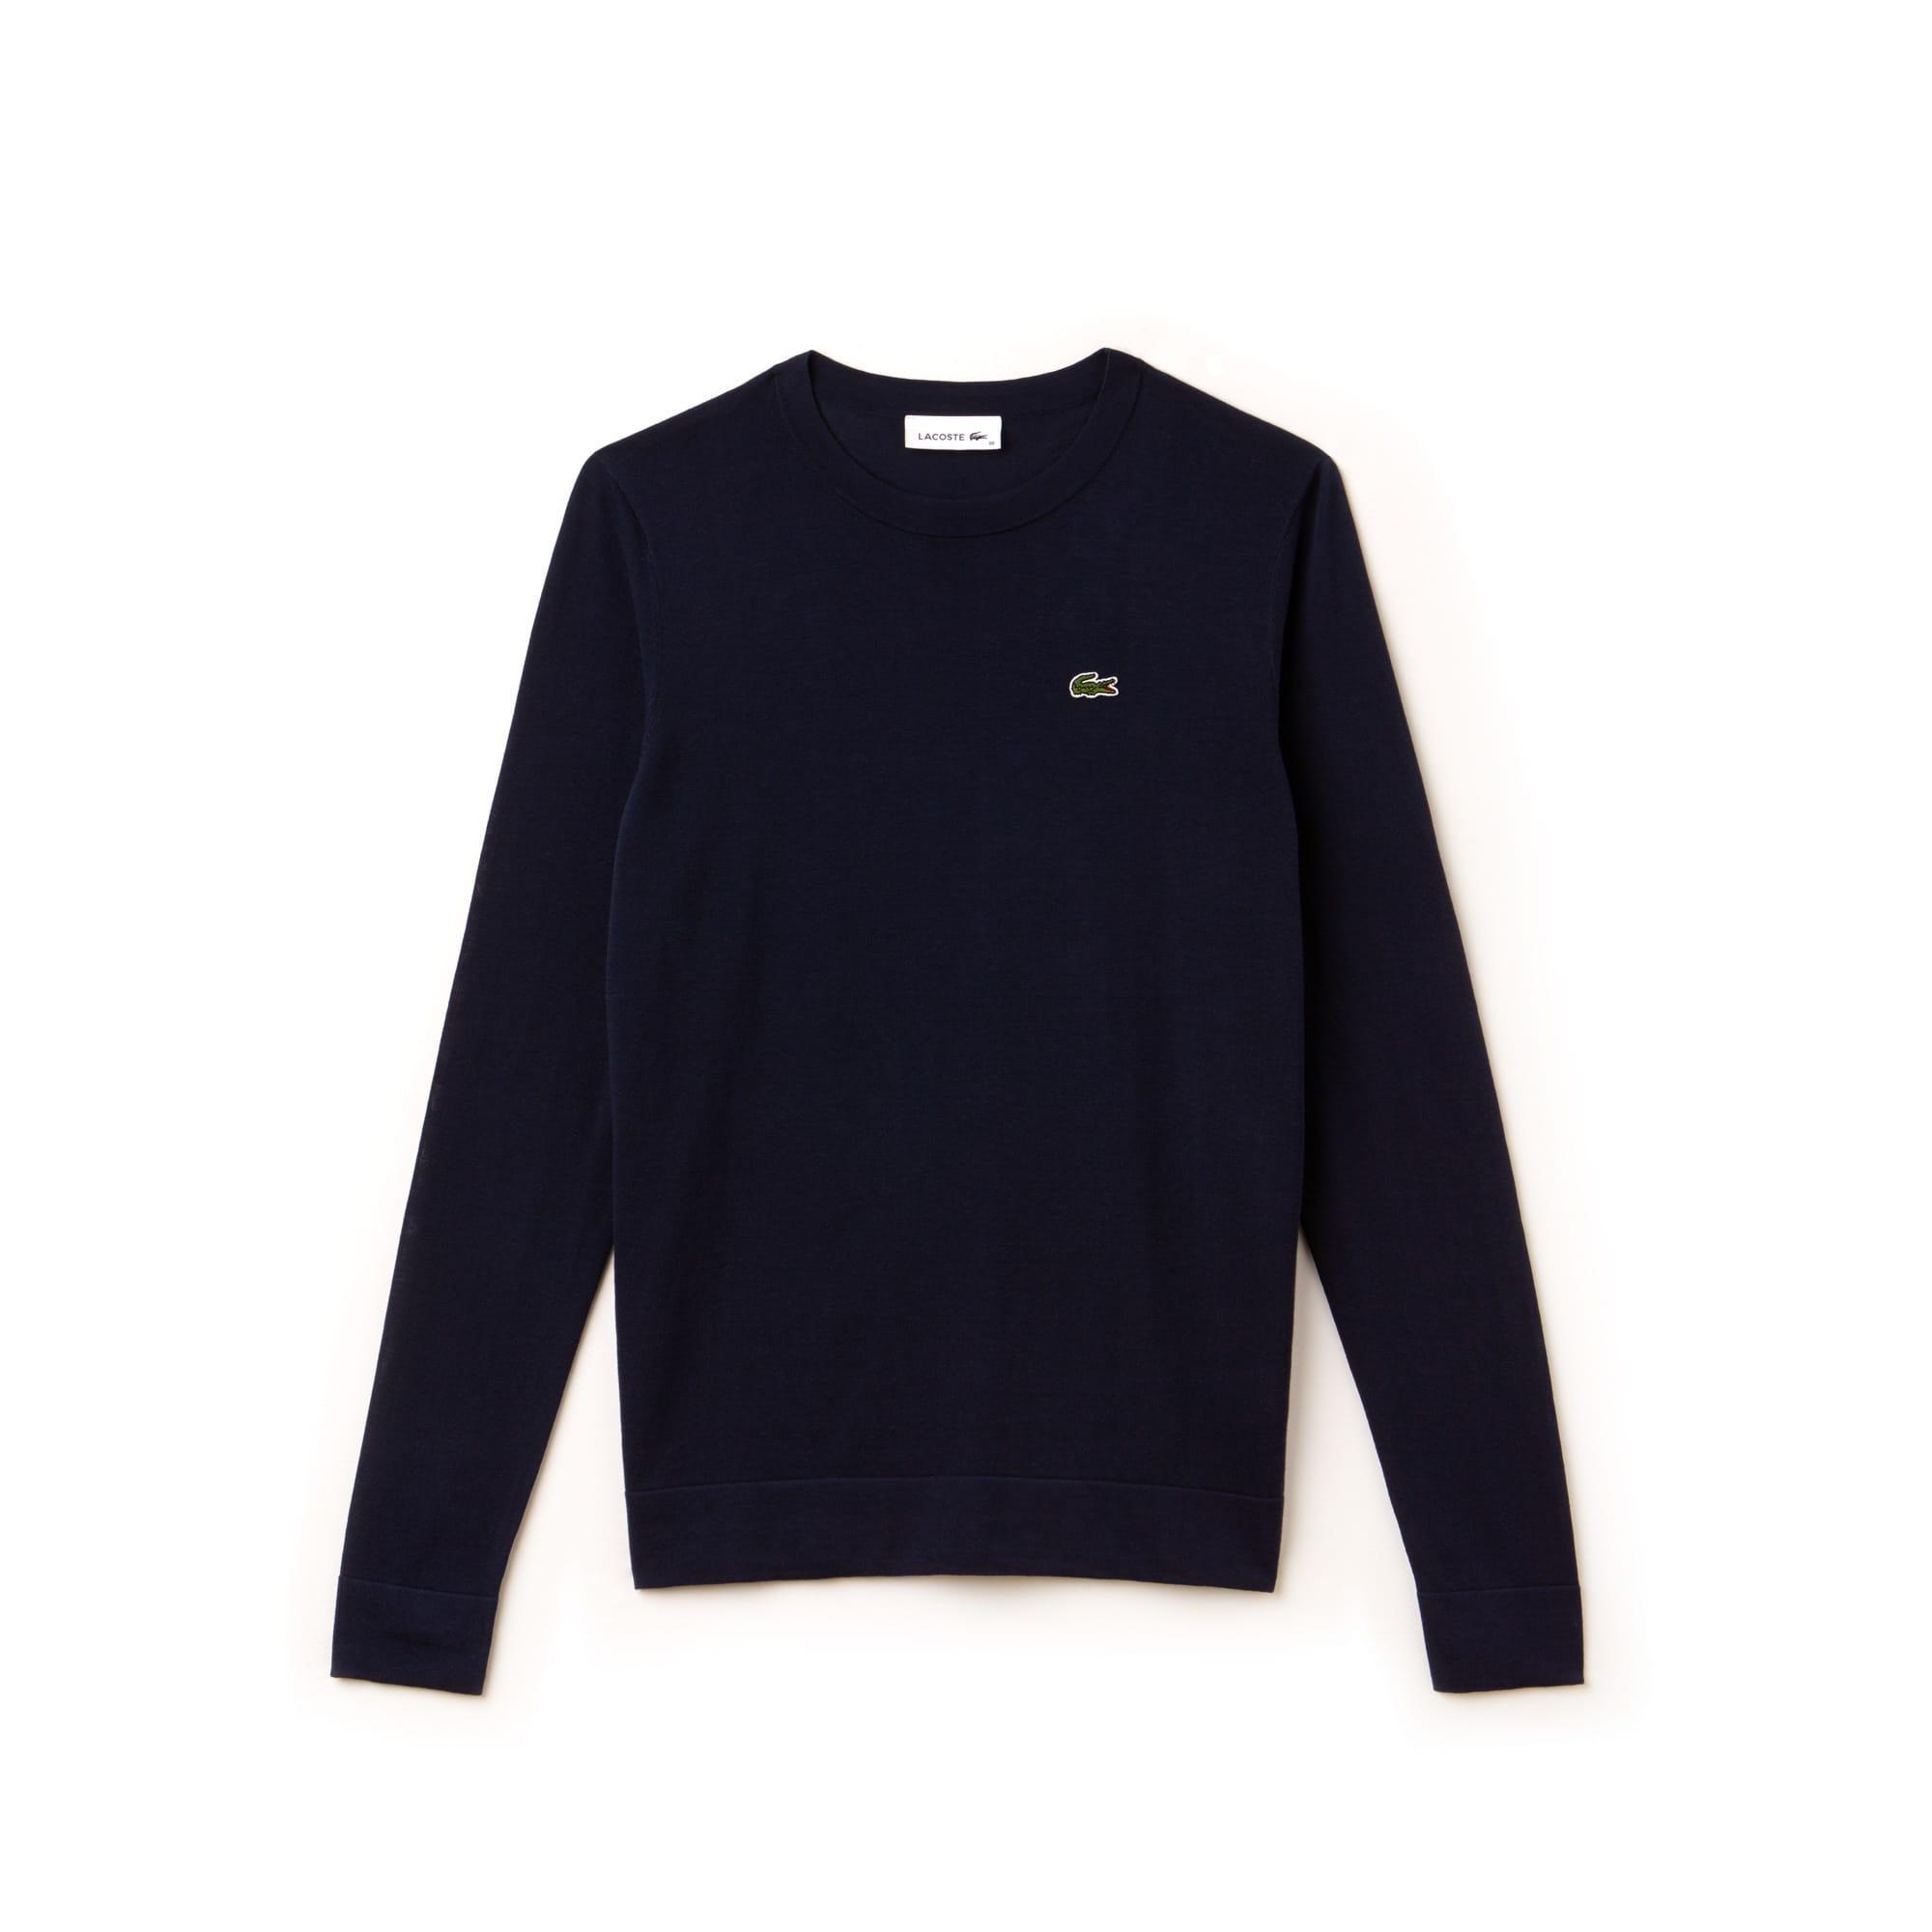 Women's High Neck Pinstriped Cotton Jersey Sweater